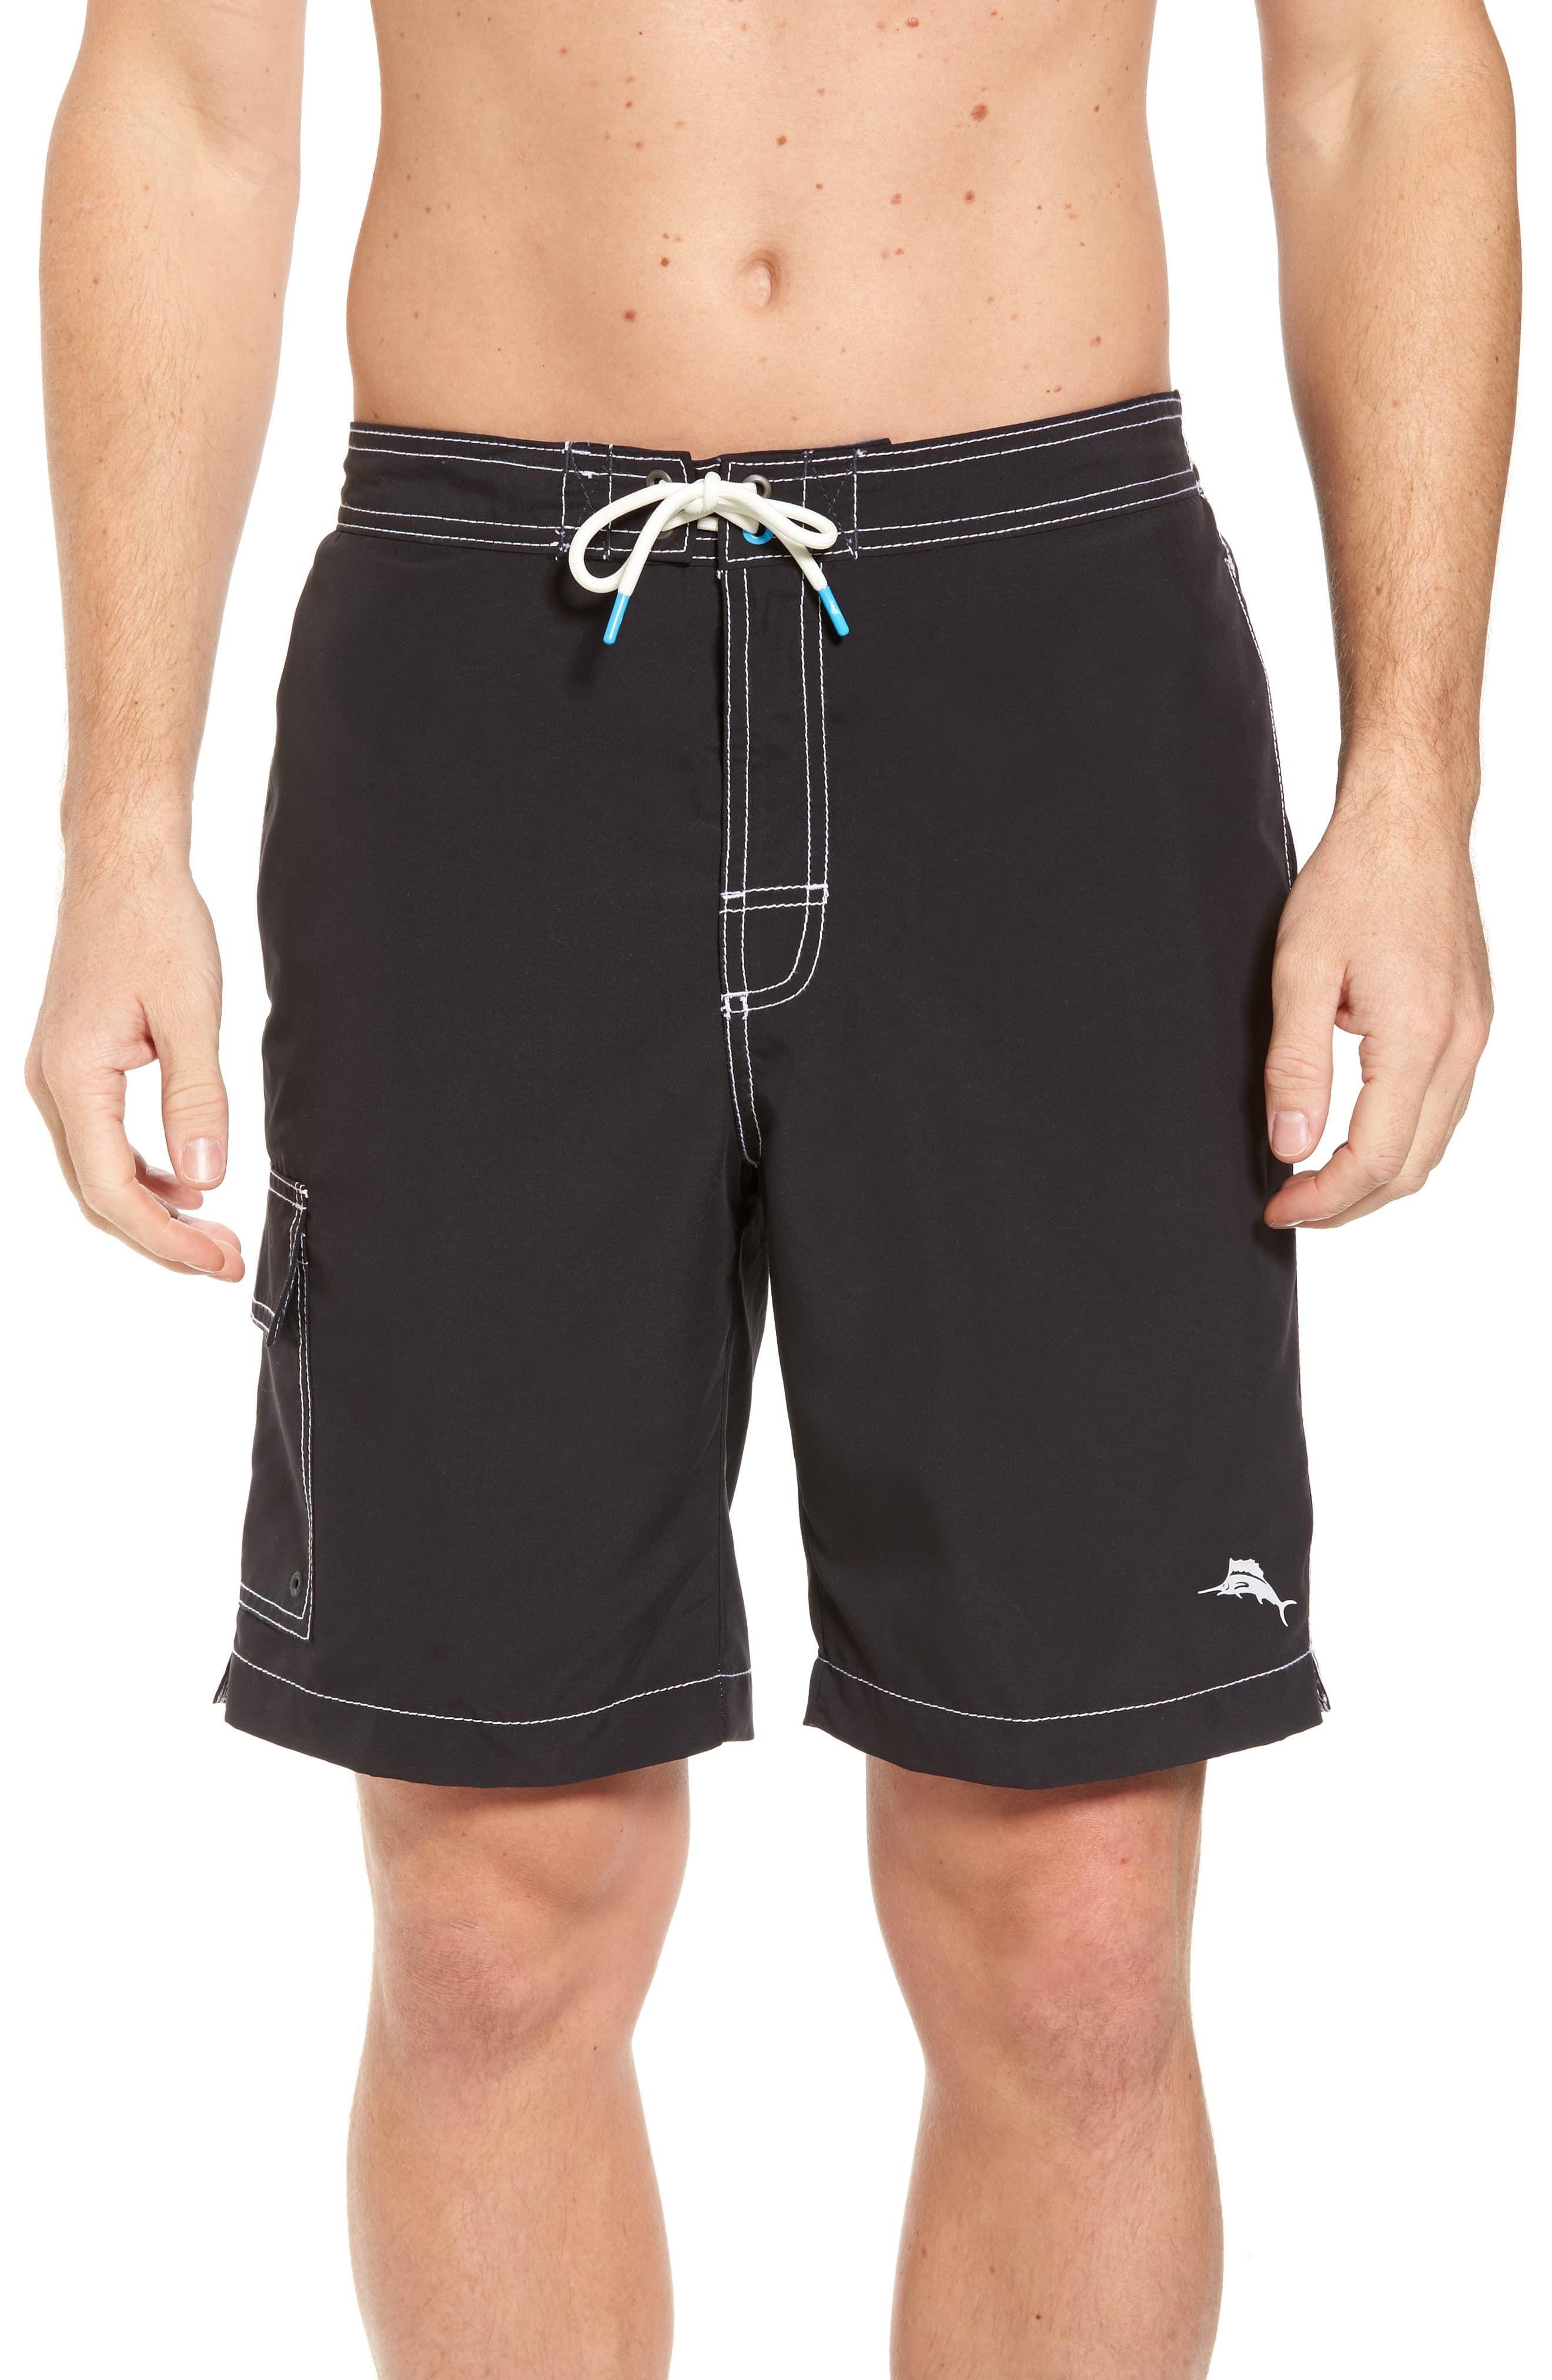 661b1f584a Men's Tommy Bahama Baja Beach Board Shorts, Size Small - Black in ...